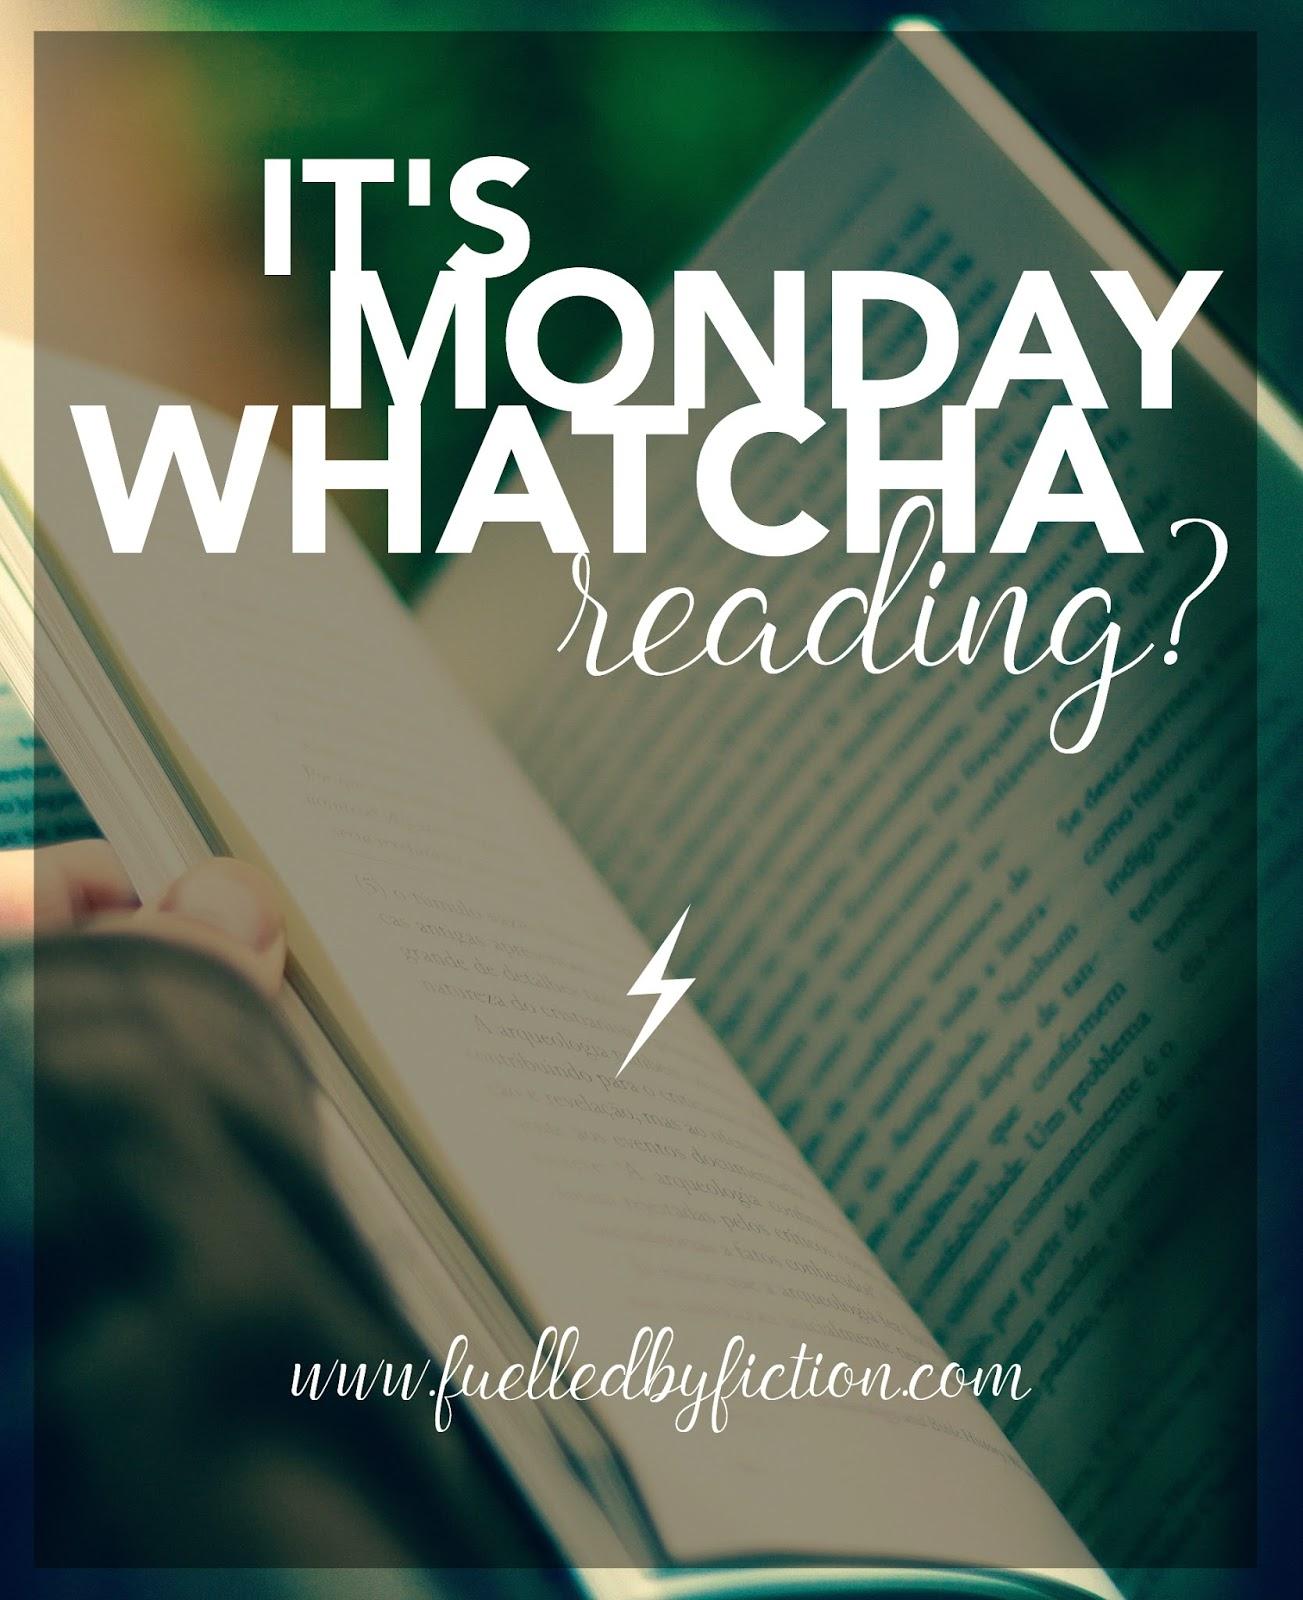 It's Monday April 26th! Whatcha Reading?